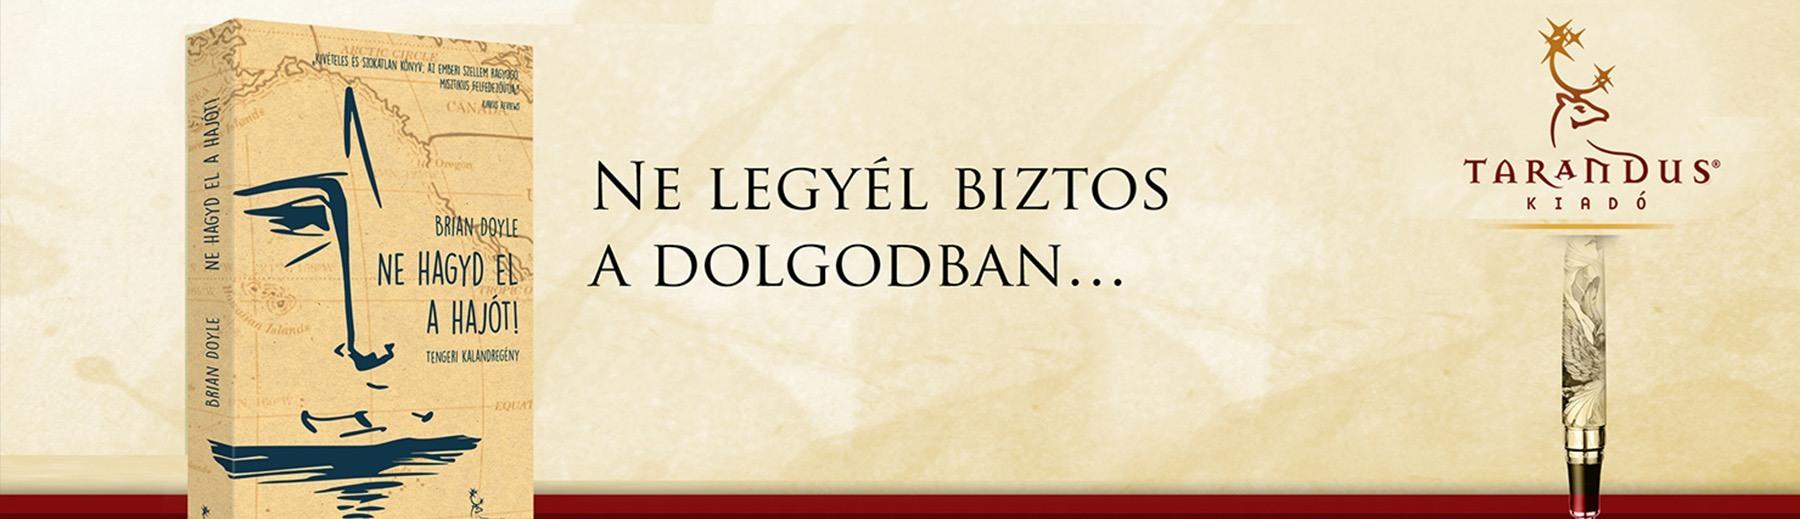 http://admin.konyvaruhaz.info/media/files/nehagyd_jo.jpg